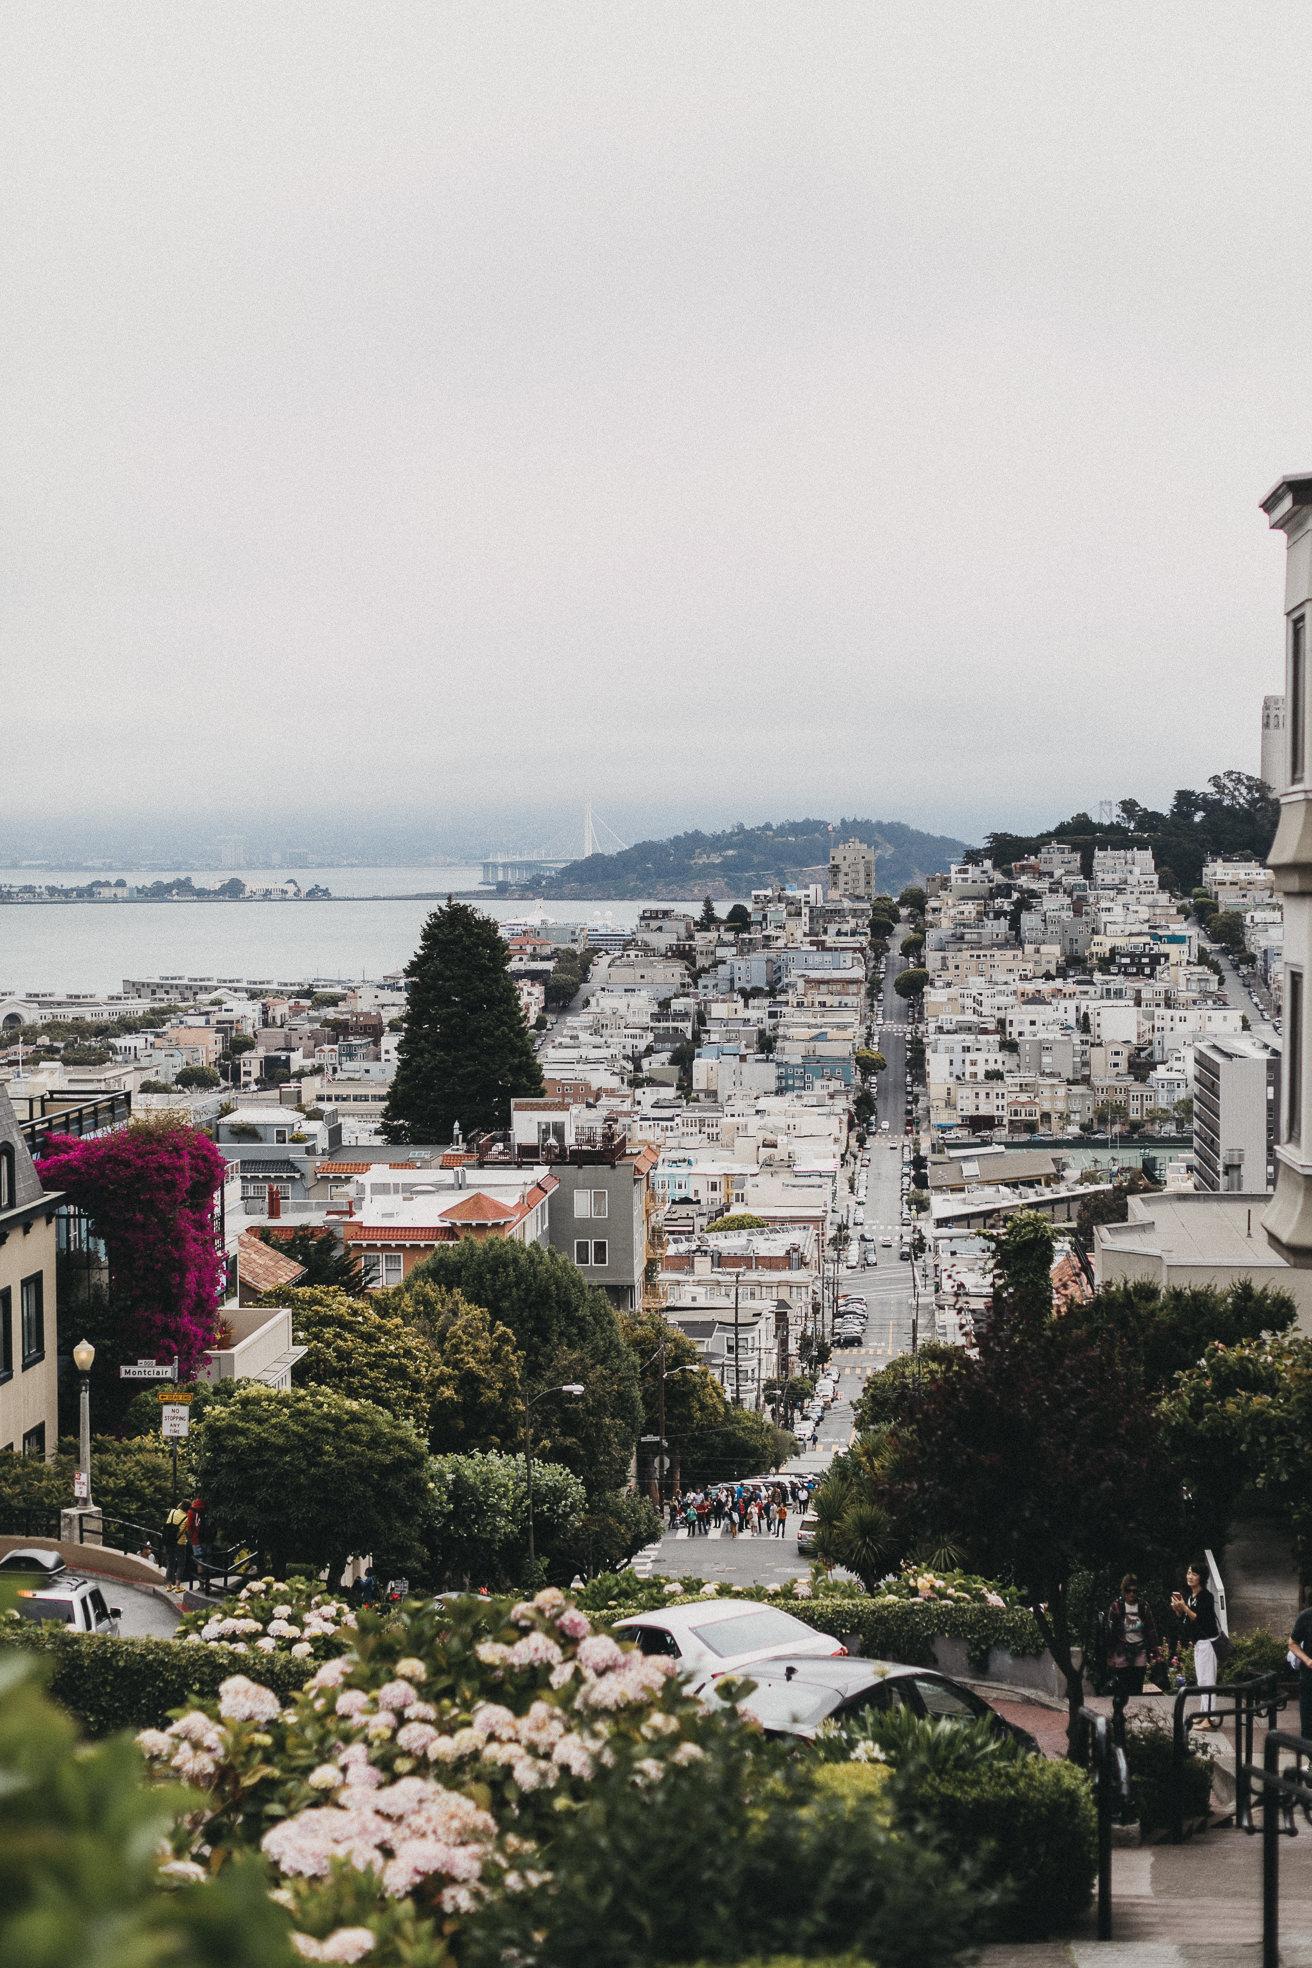 San-Francisco-BildervomLeben-7873